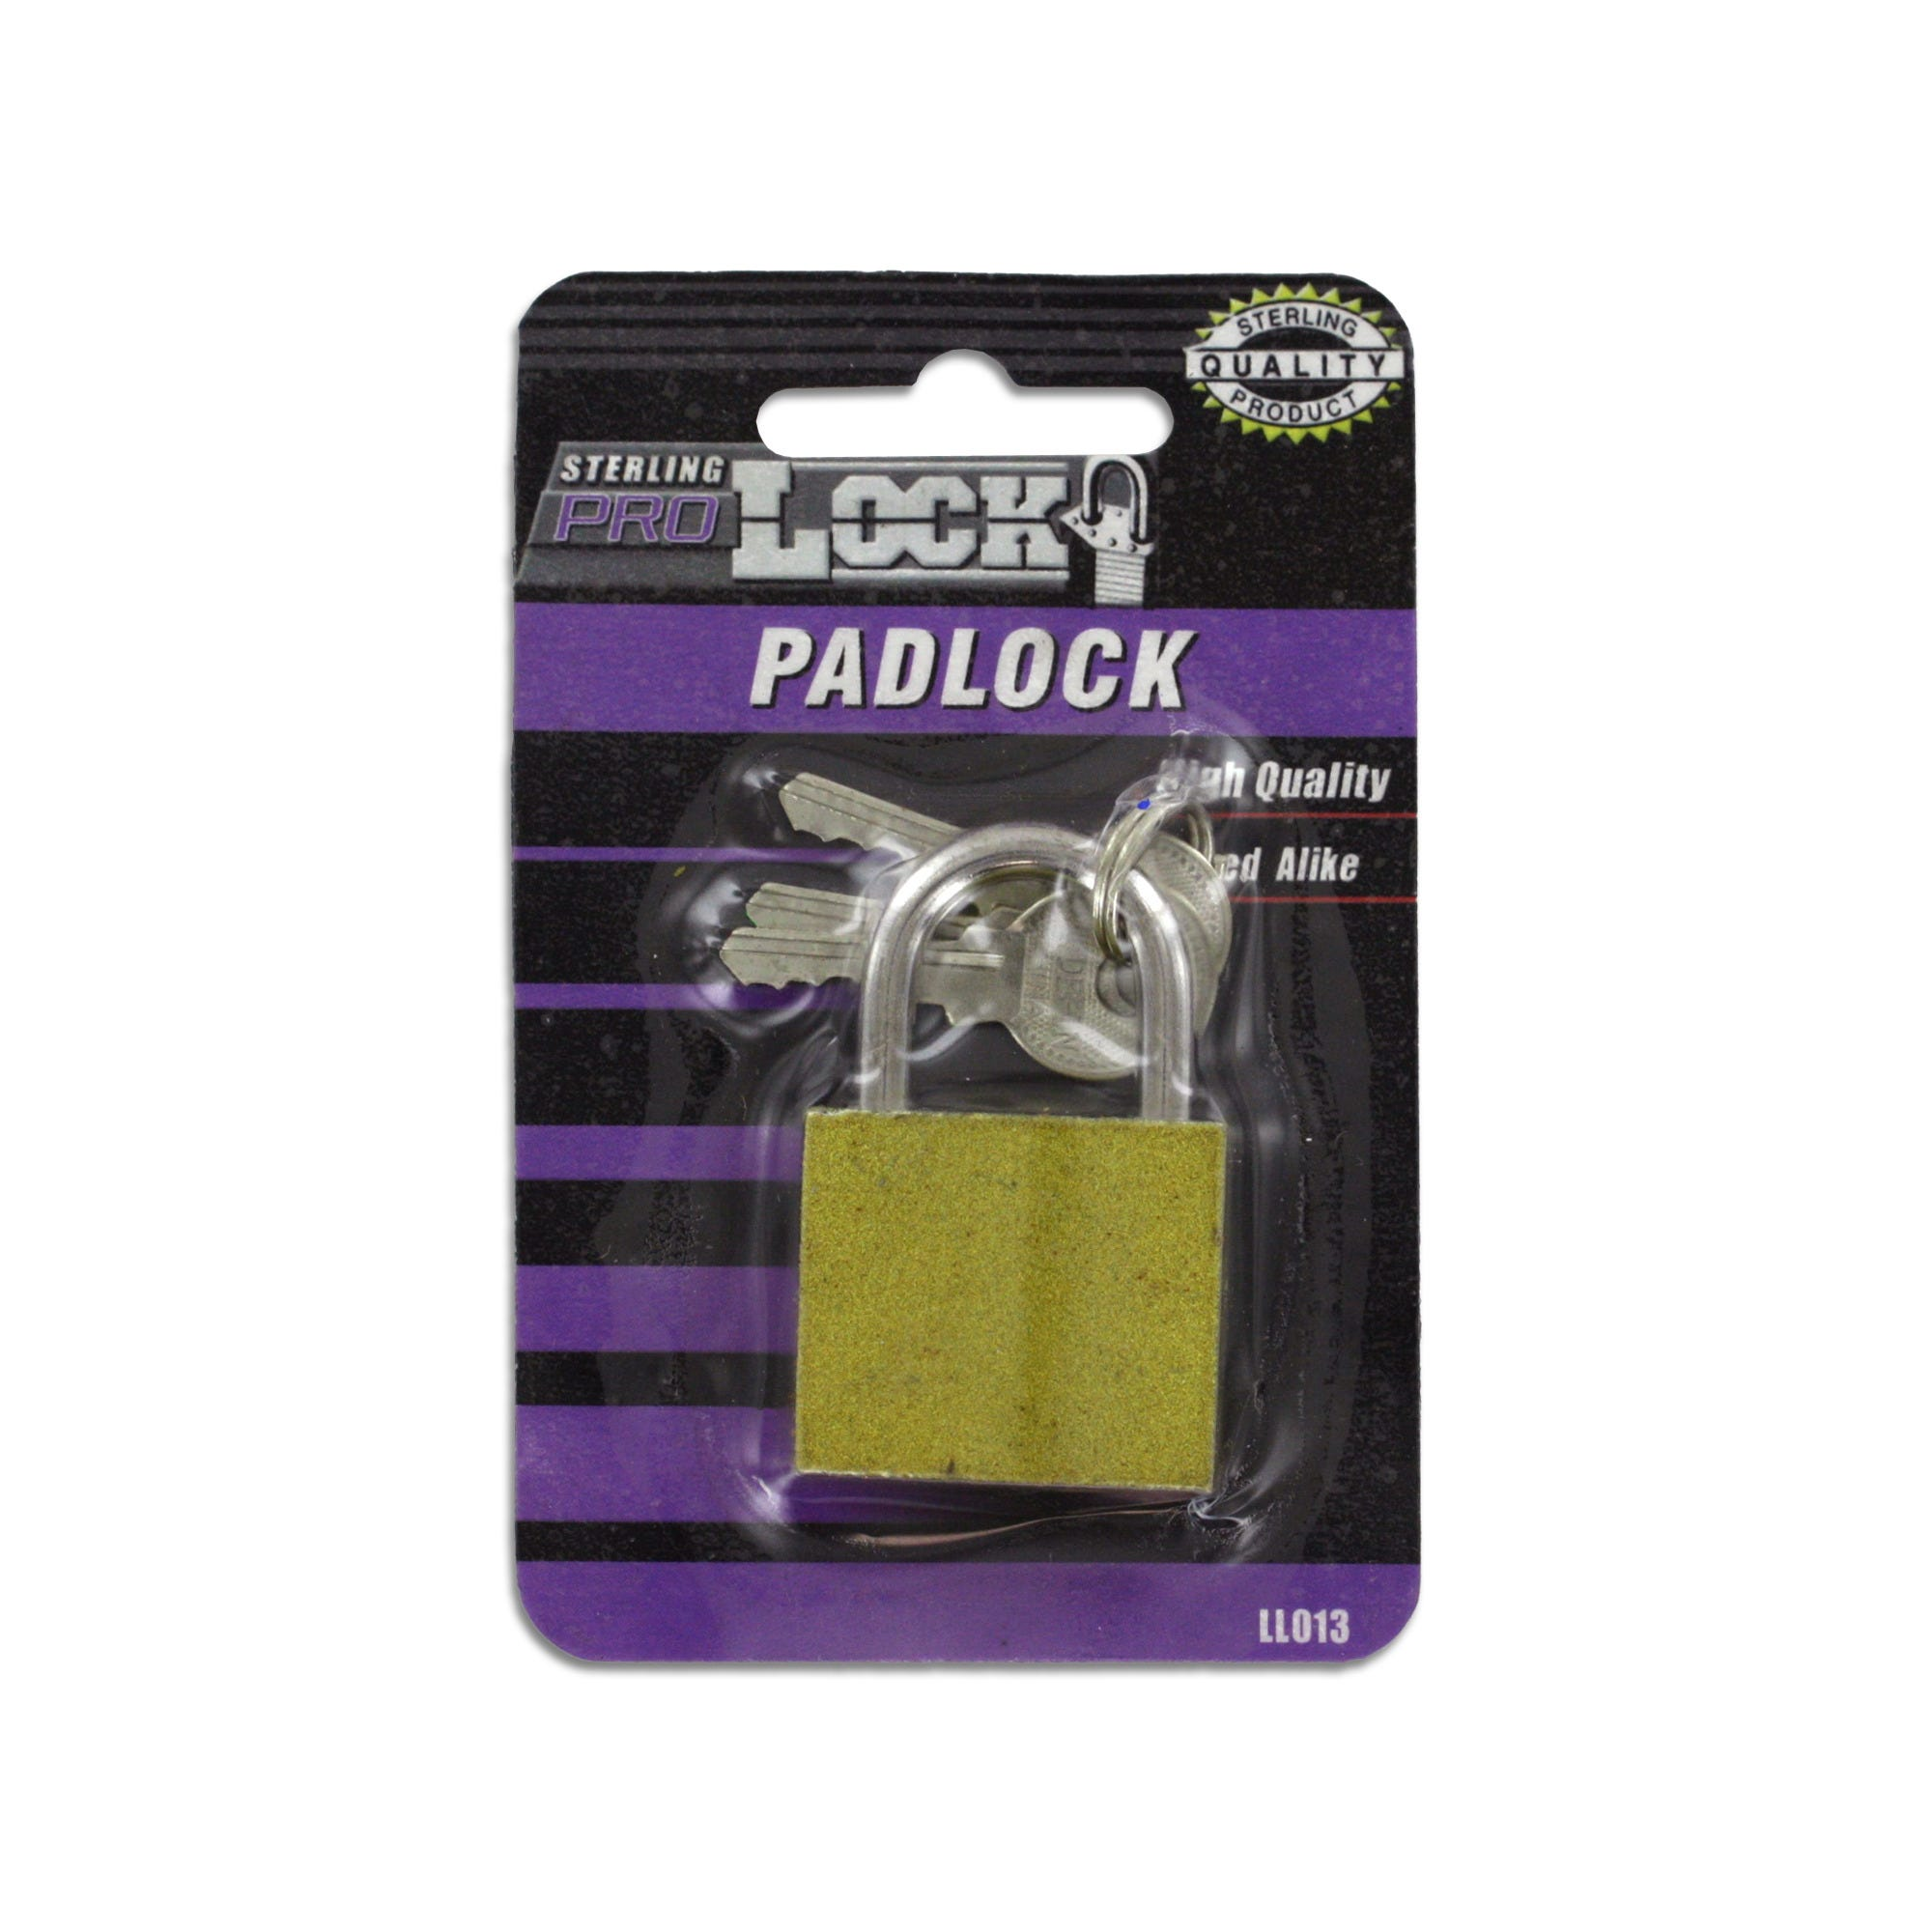 Iron Padlock with Keys